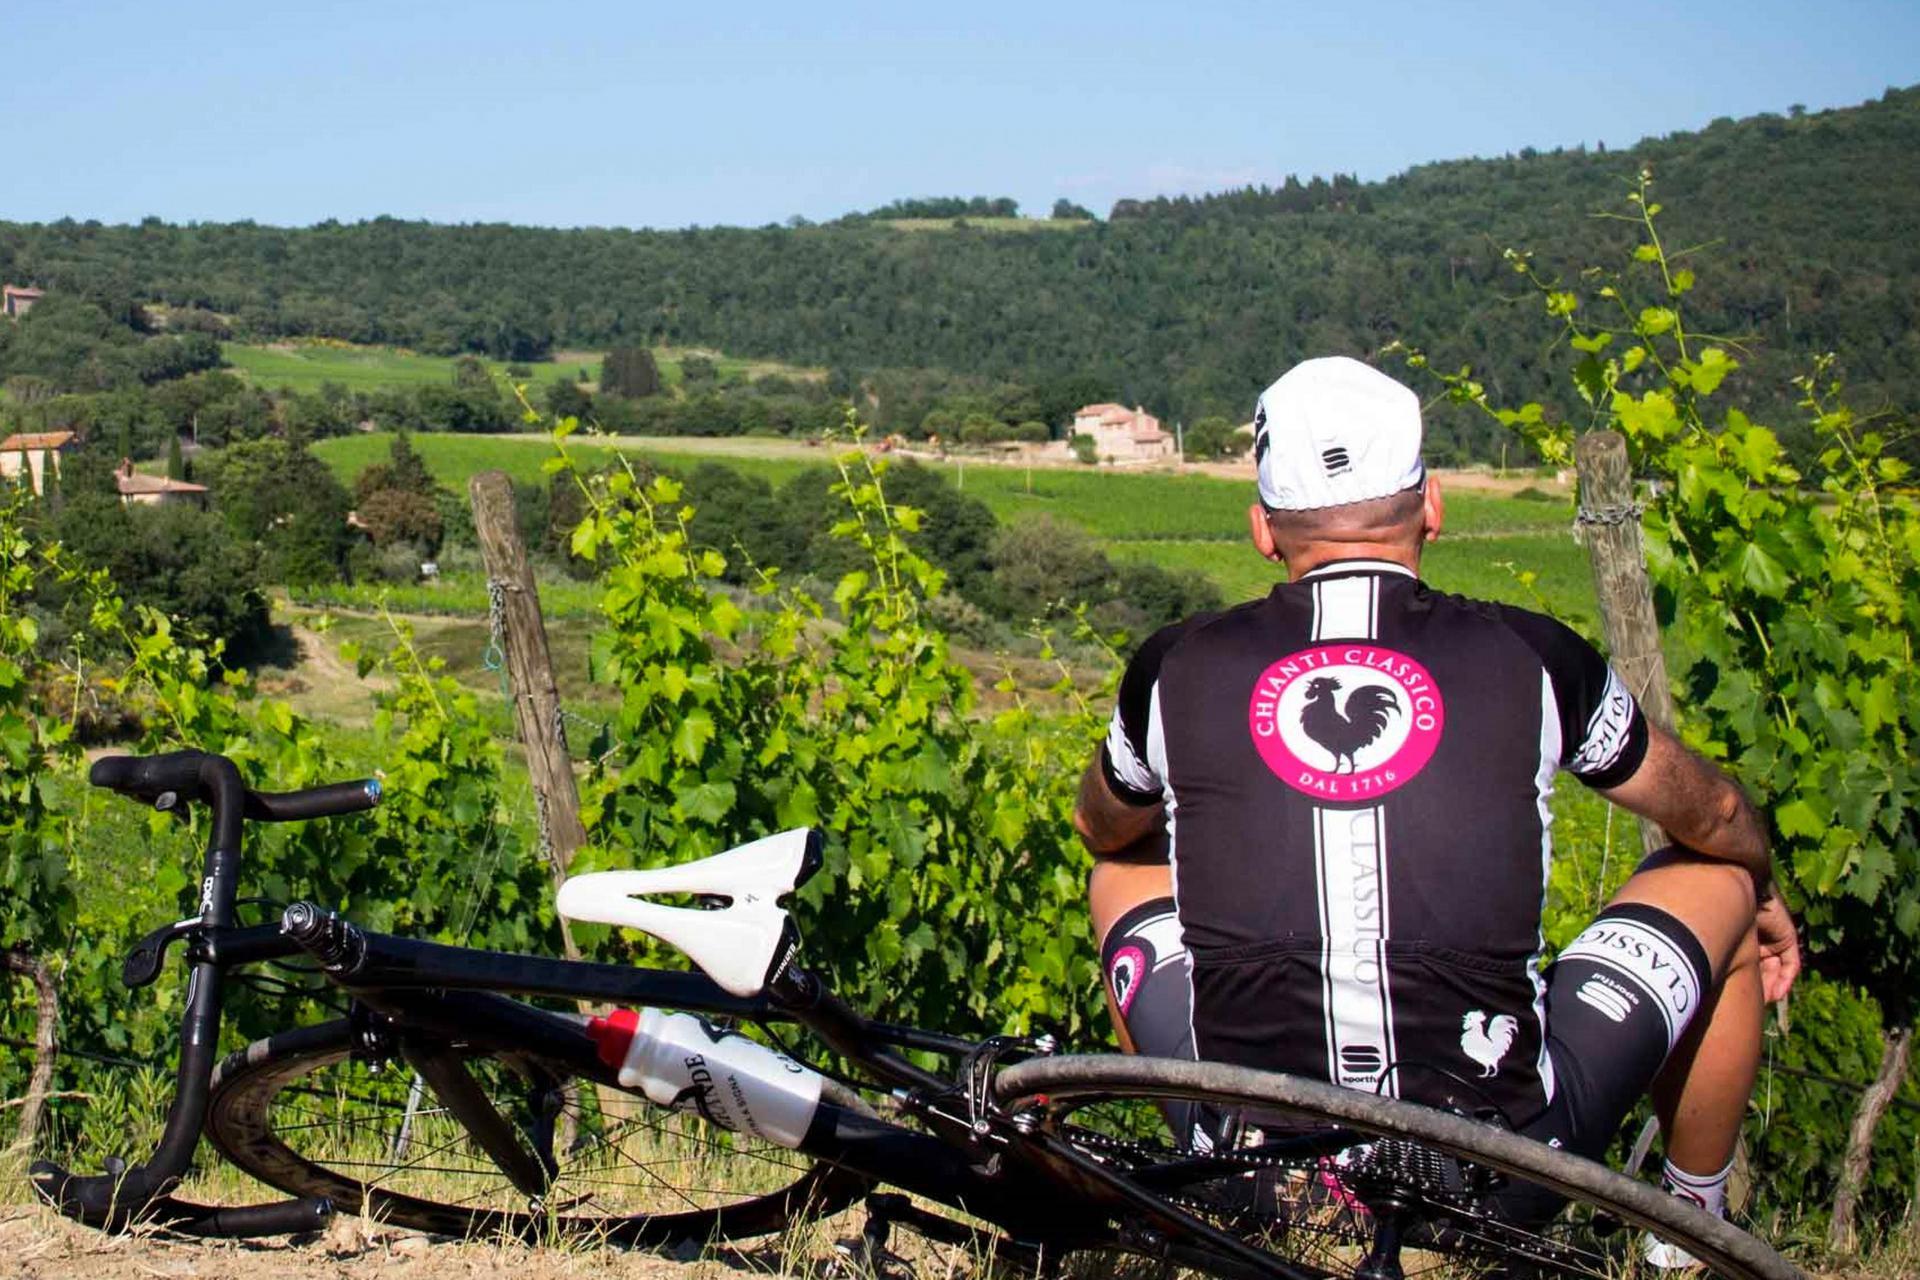 Agriturismo Toscane Grote agriturismo centraal in Toscane met prachtig uitzicht